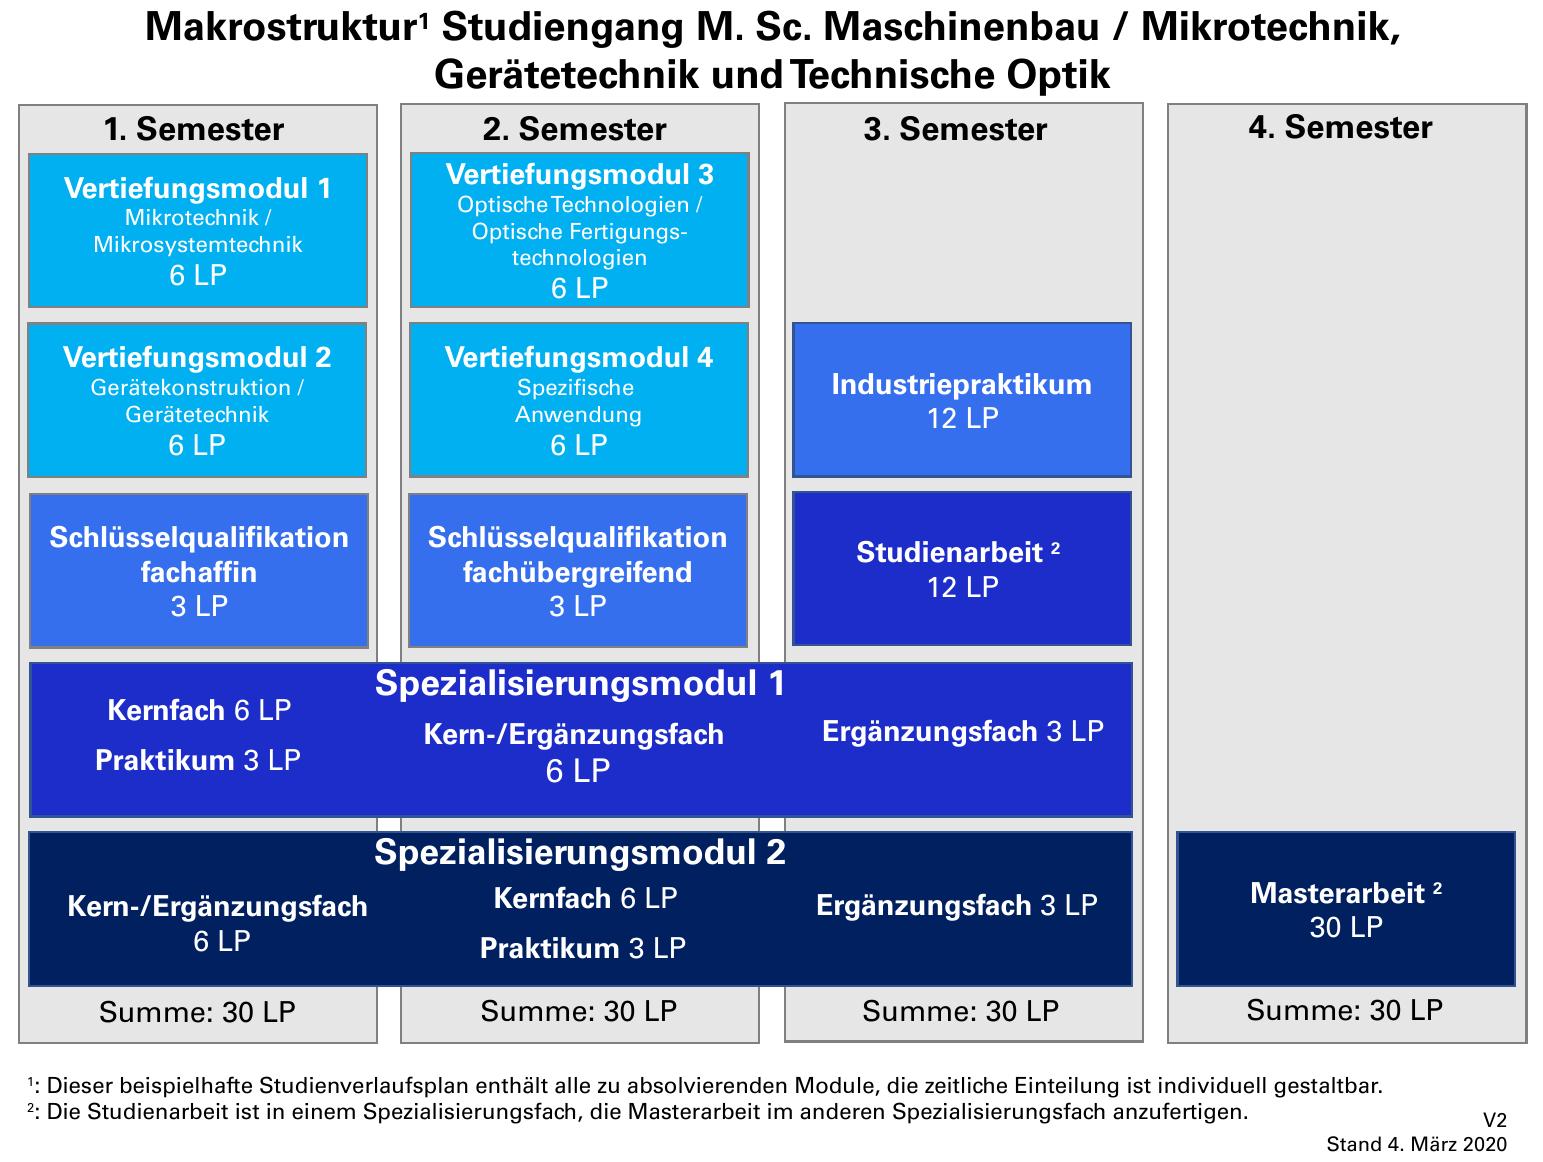 Aufbau des Studiengangs Maschinenbau / Mikrotechnik, Gerätetechnik und Technische Optik